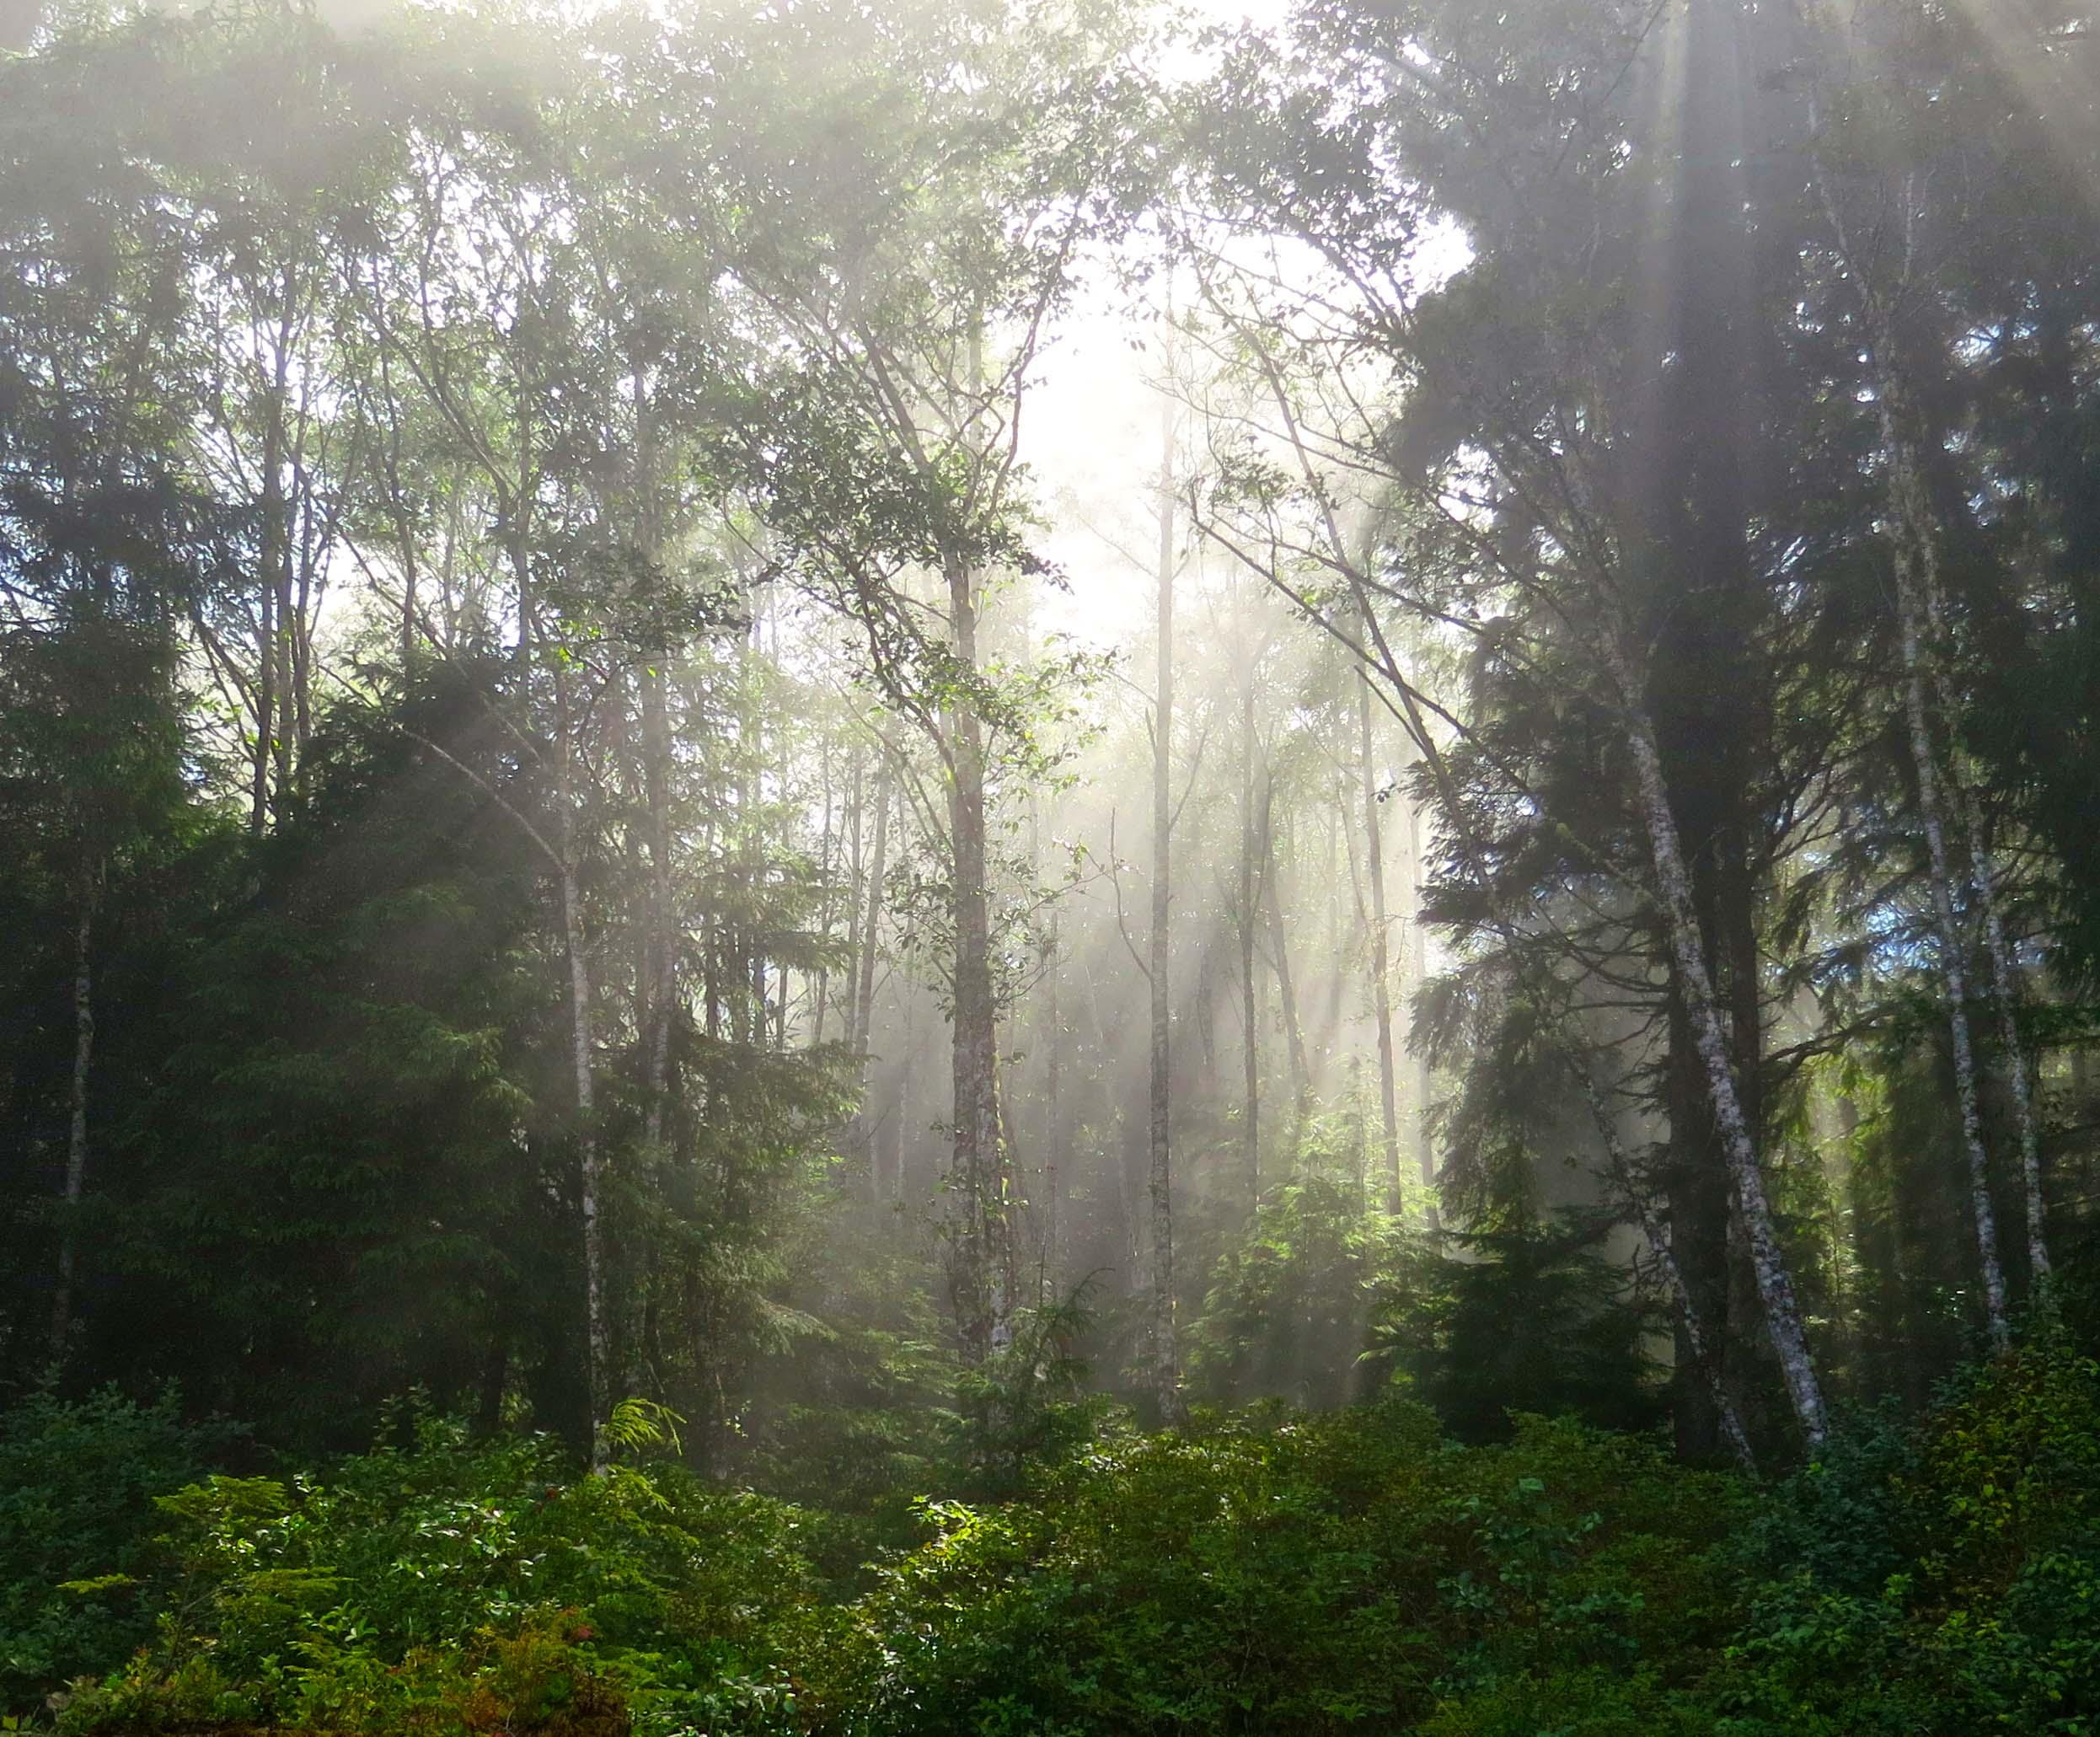 Mist in trees on Vancouver Island sea kayak trip. Photo by Curtis Mekemson.